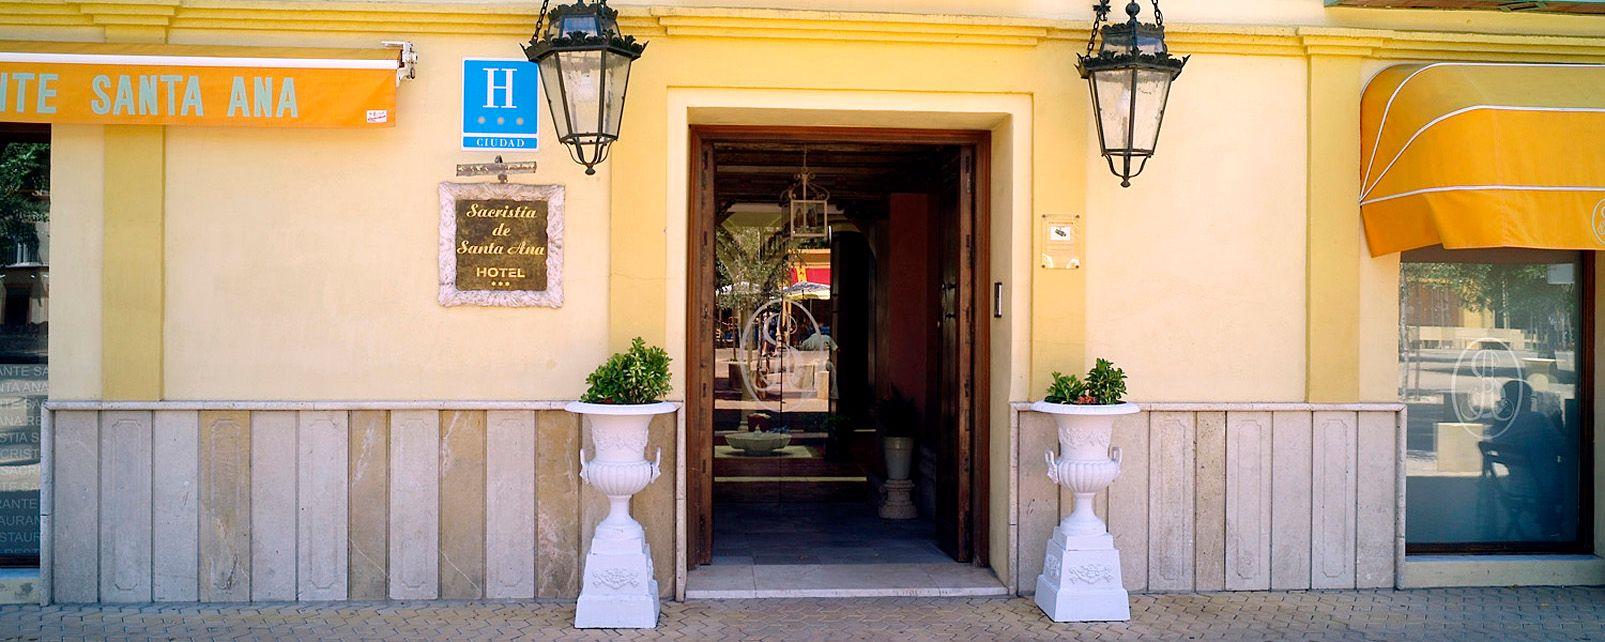 Hotel Casa Sacristía Santa Ana